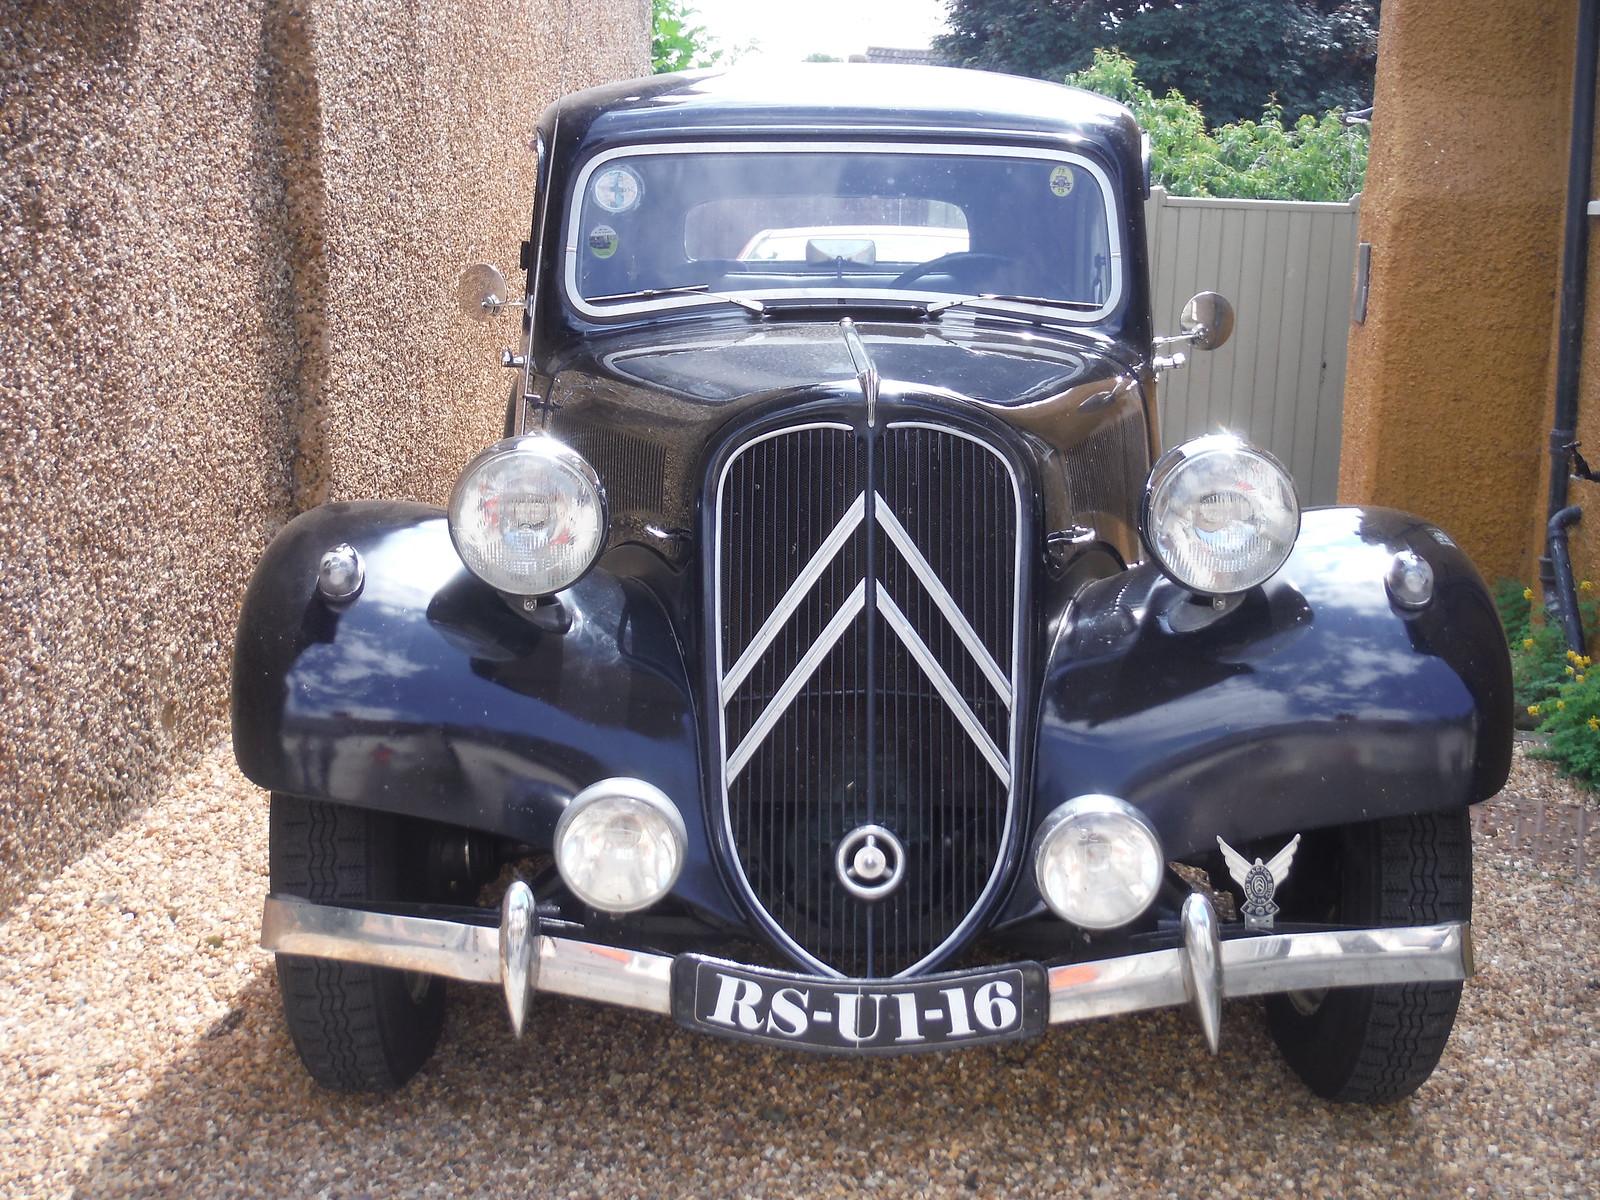 Old Car, Shillington SWC Walk 233 - Arlesey to Letchworth Garden City